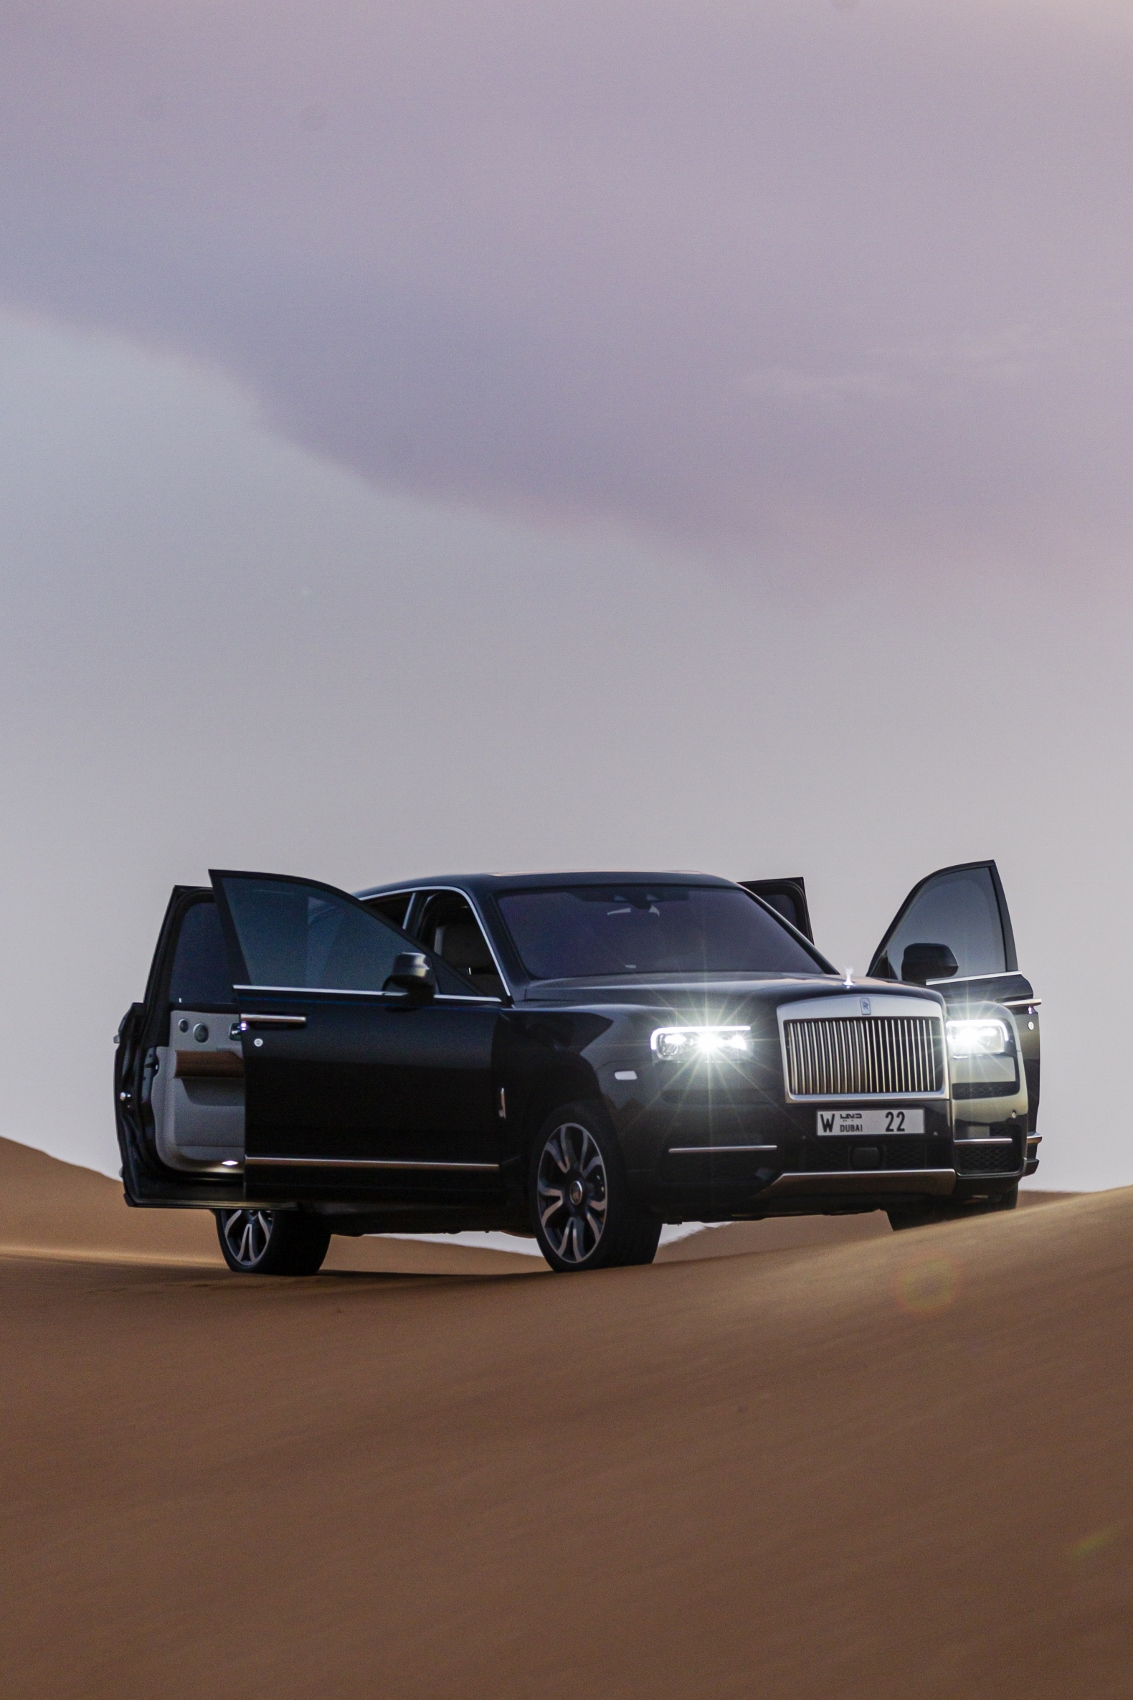 Rolls Royce Cullinan sa predviedol na púšti. Pozrite si foto aj video fHruy9mhlW rolls-royce-cullina